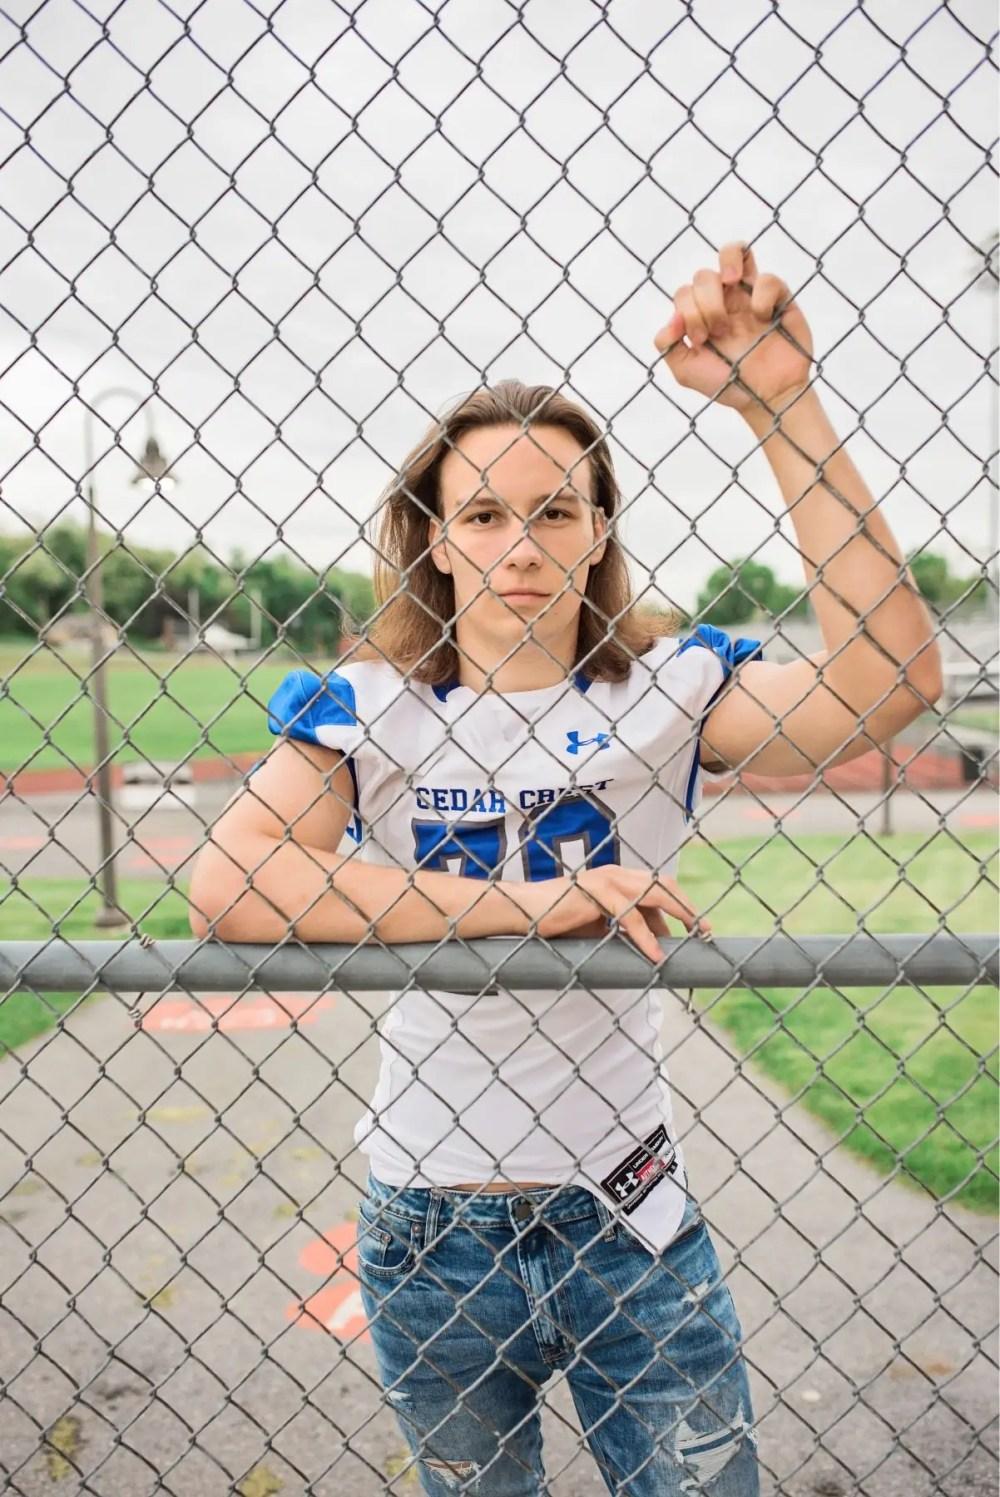 Sports Senior Photoshoot In Harrisburg PA